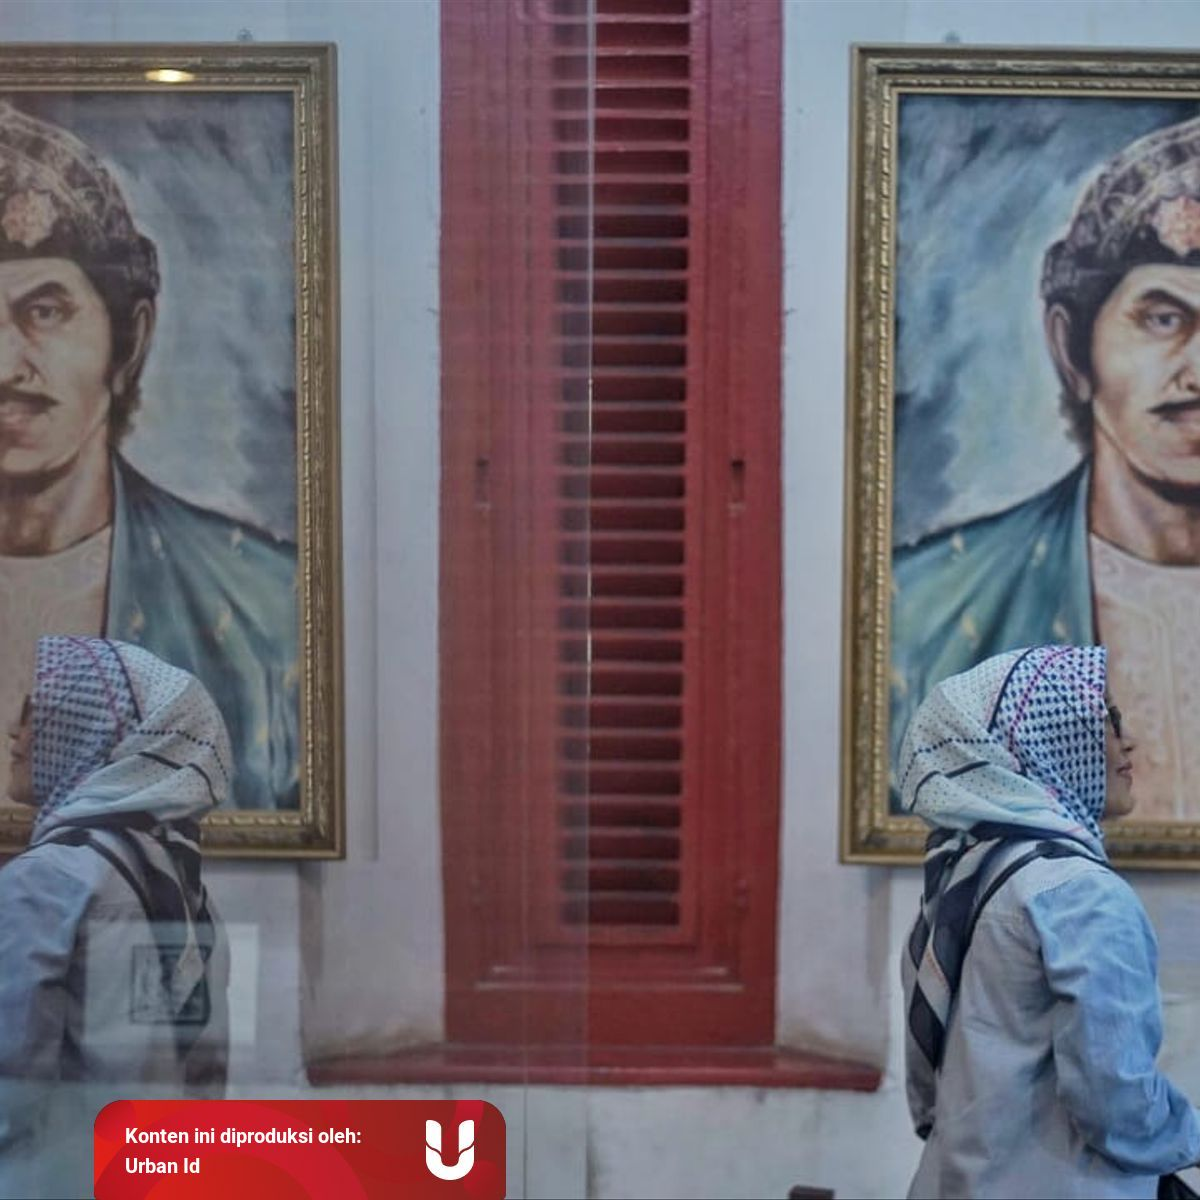 Foto Mengunjungi Museum Sultan Mahmud Badaruddin Ii Palembang Kumparan Com